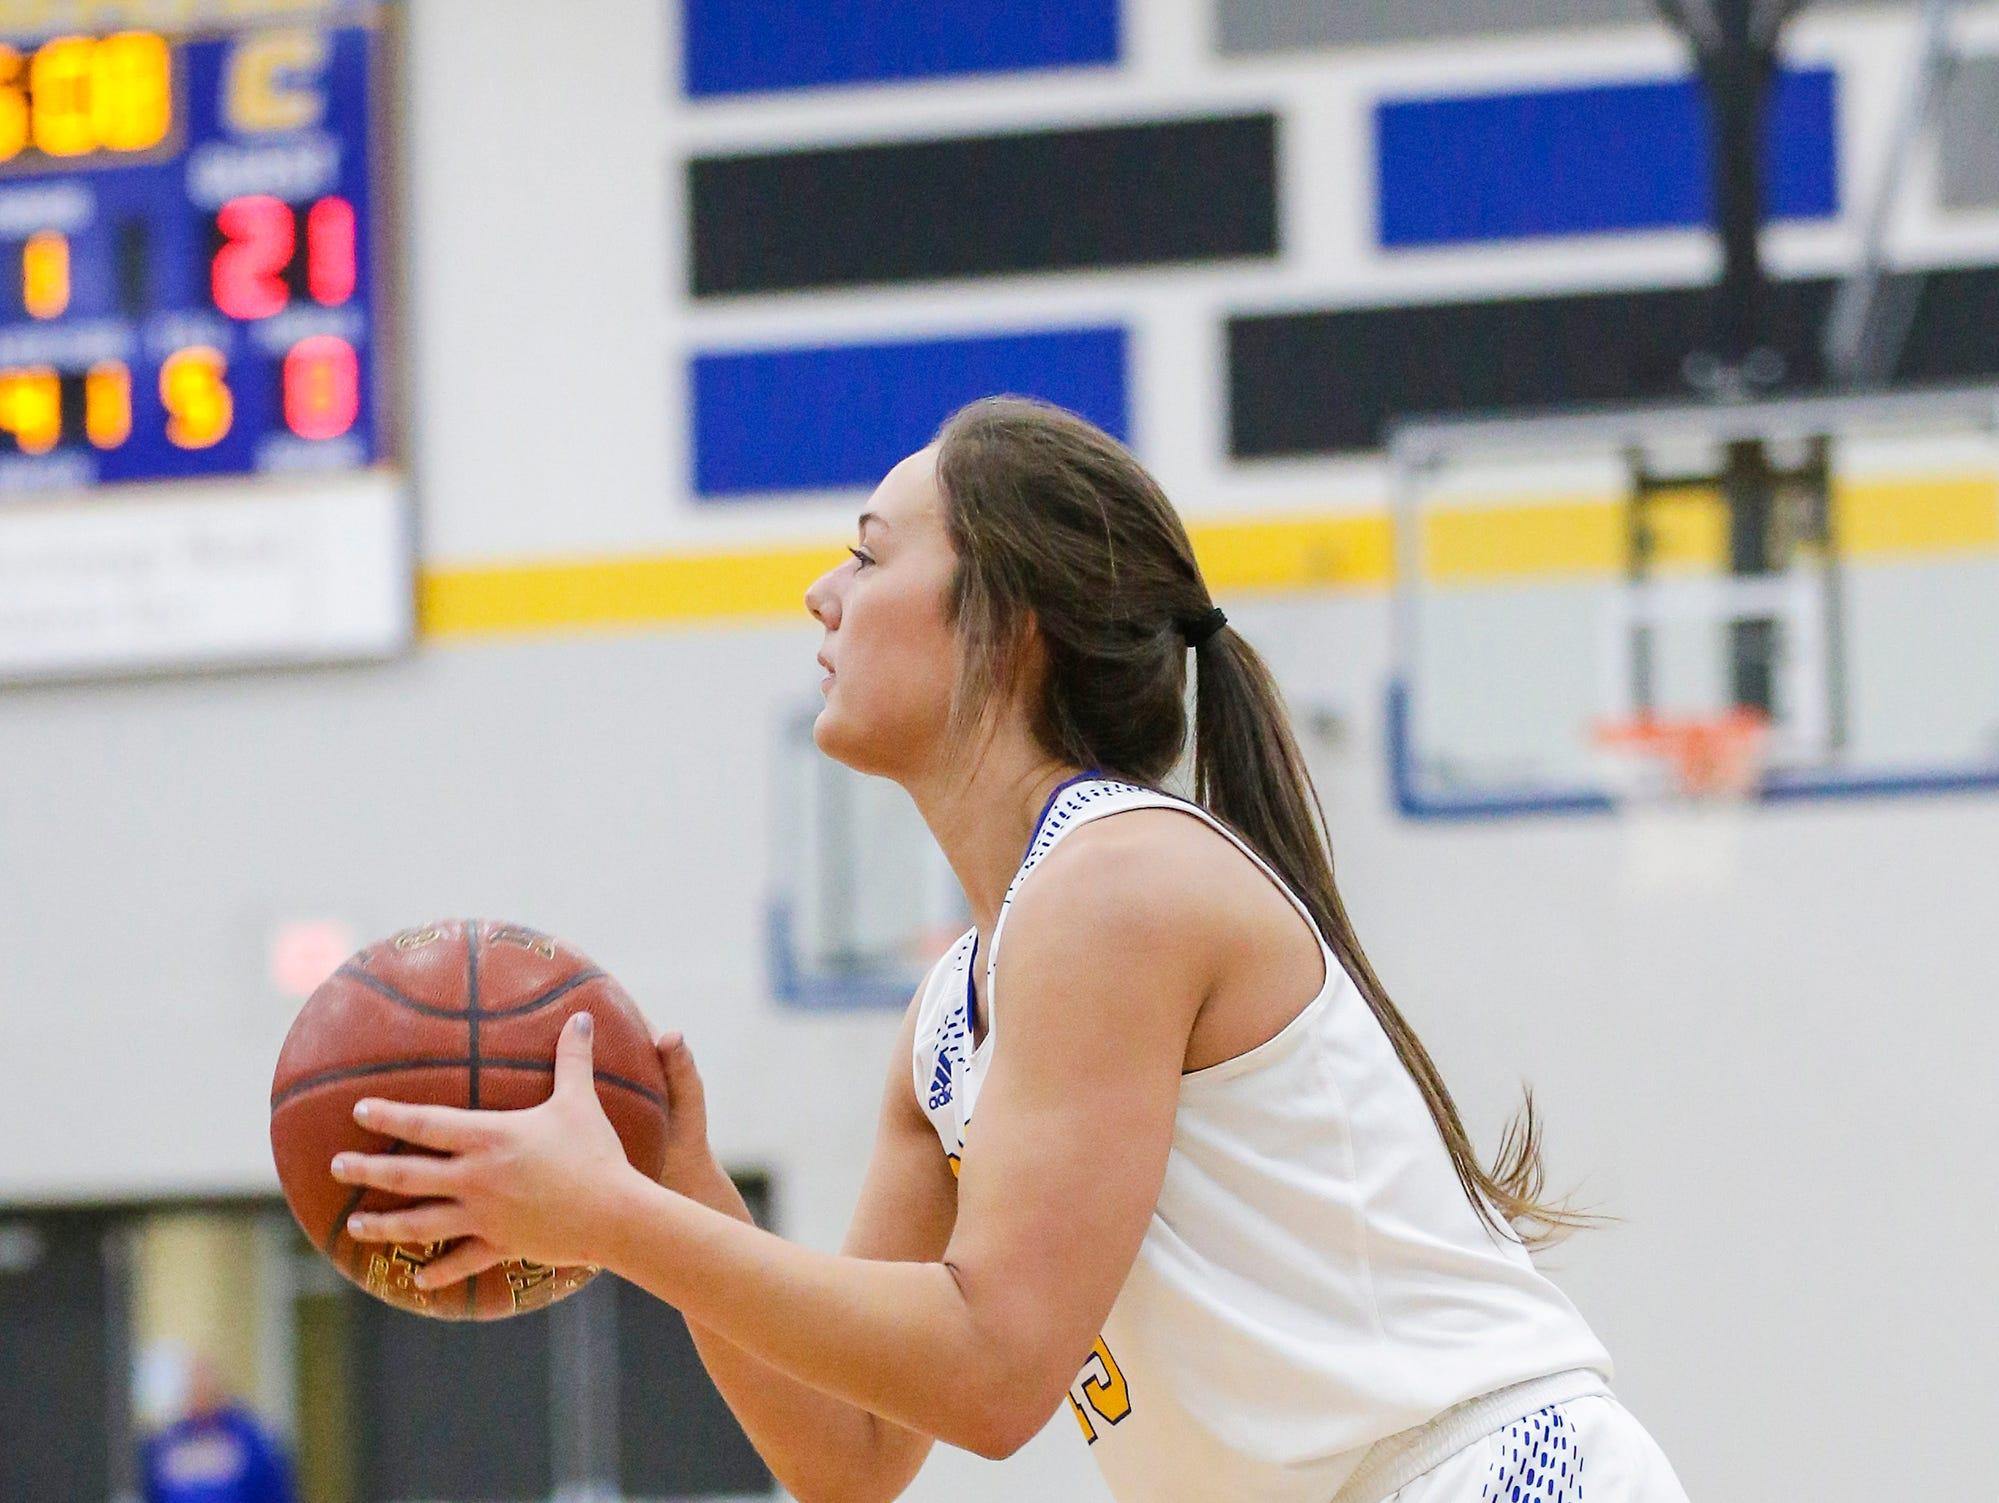 Campbellsport High School girls basketball's Grace Nerat attempts a three pointer against Lomira High School during their game Friday, December 28, 2018 in Campbellsport. Doug Raflik/USA TODAY NETWORK-Wisconsin